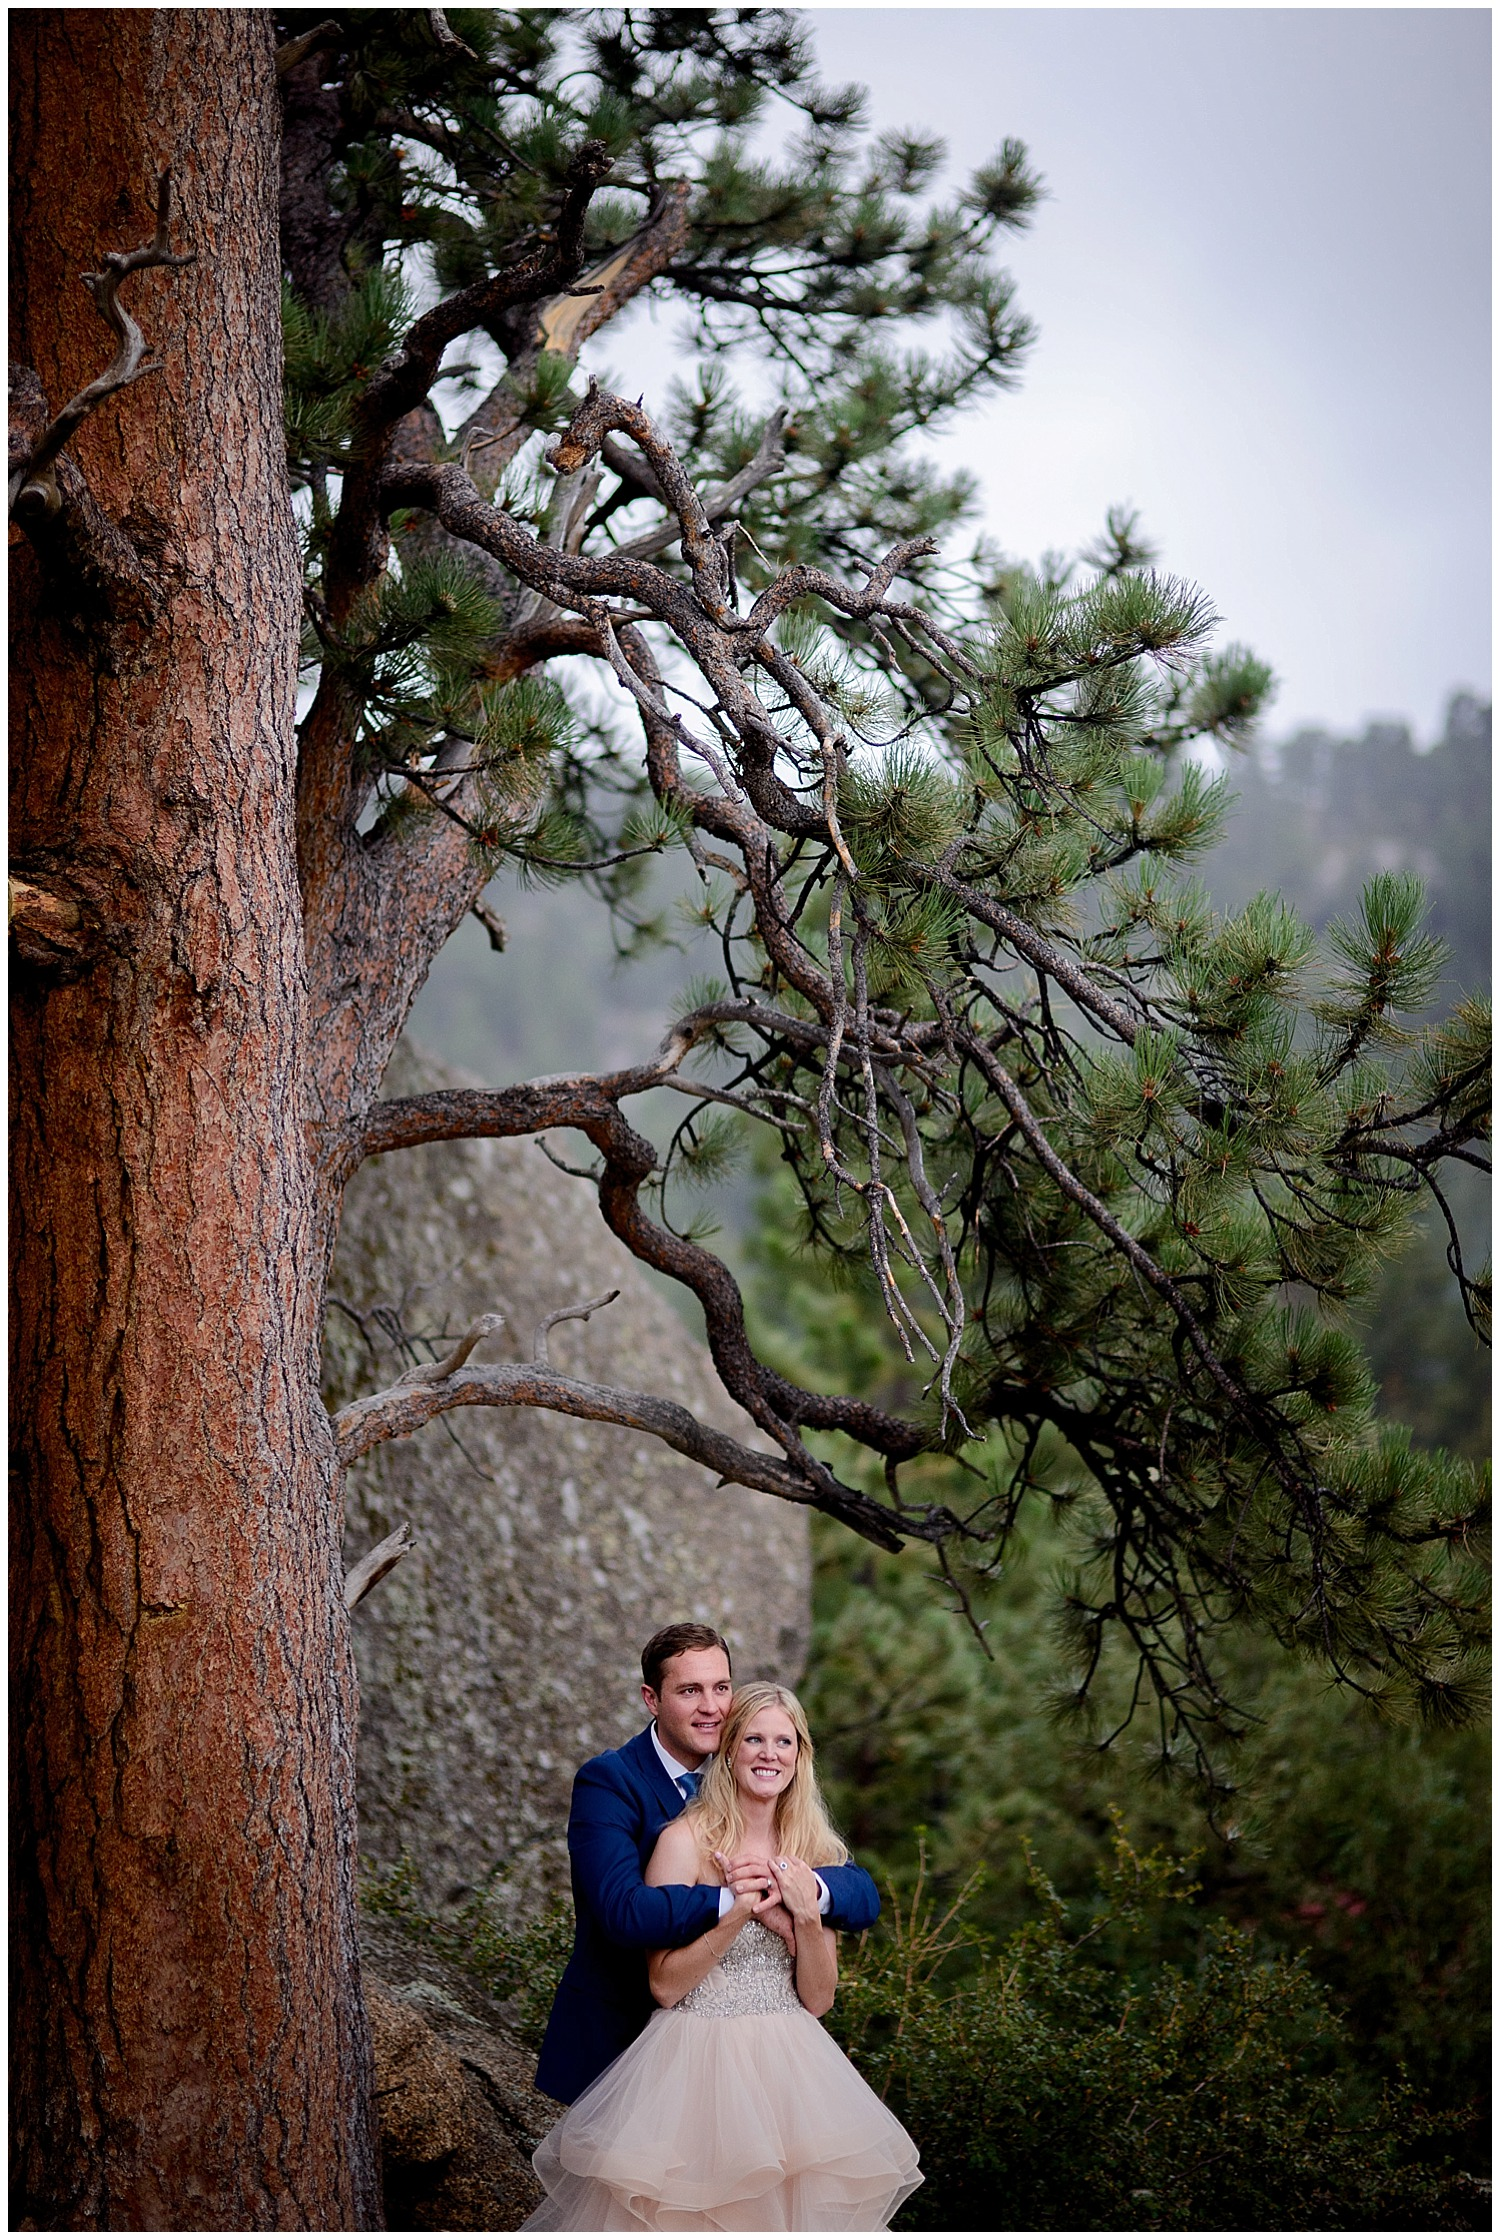 Estes-Park-Black-Canyon-Inn-Wedding-photography-_0091.jpg